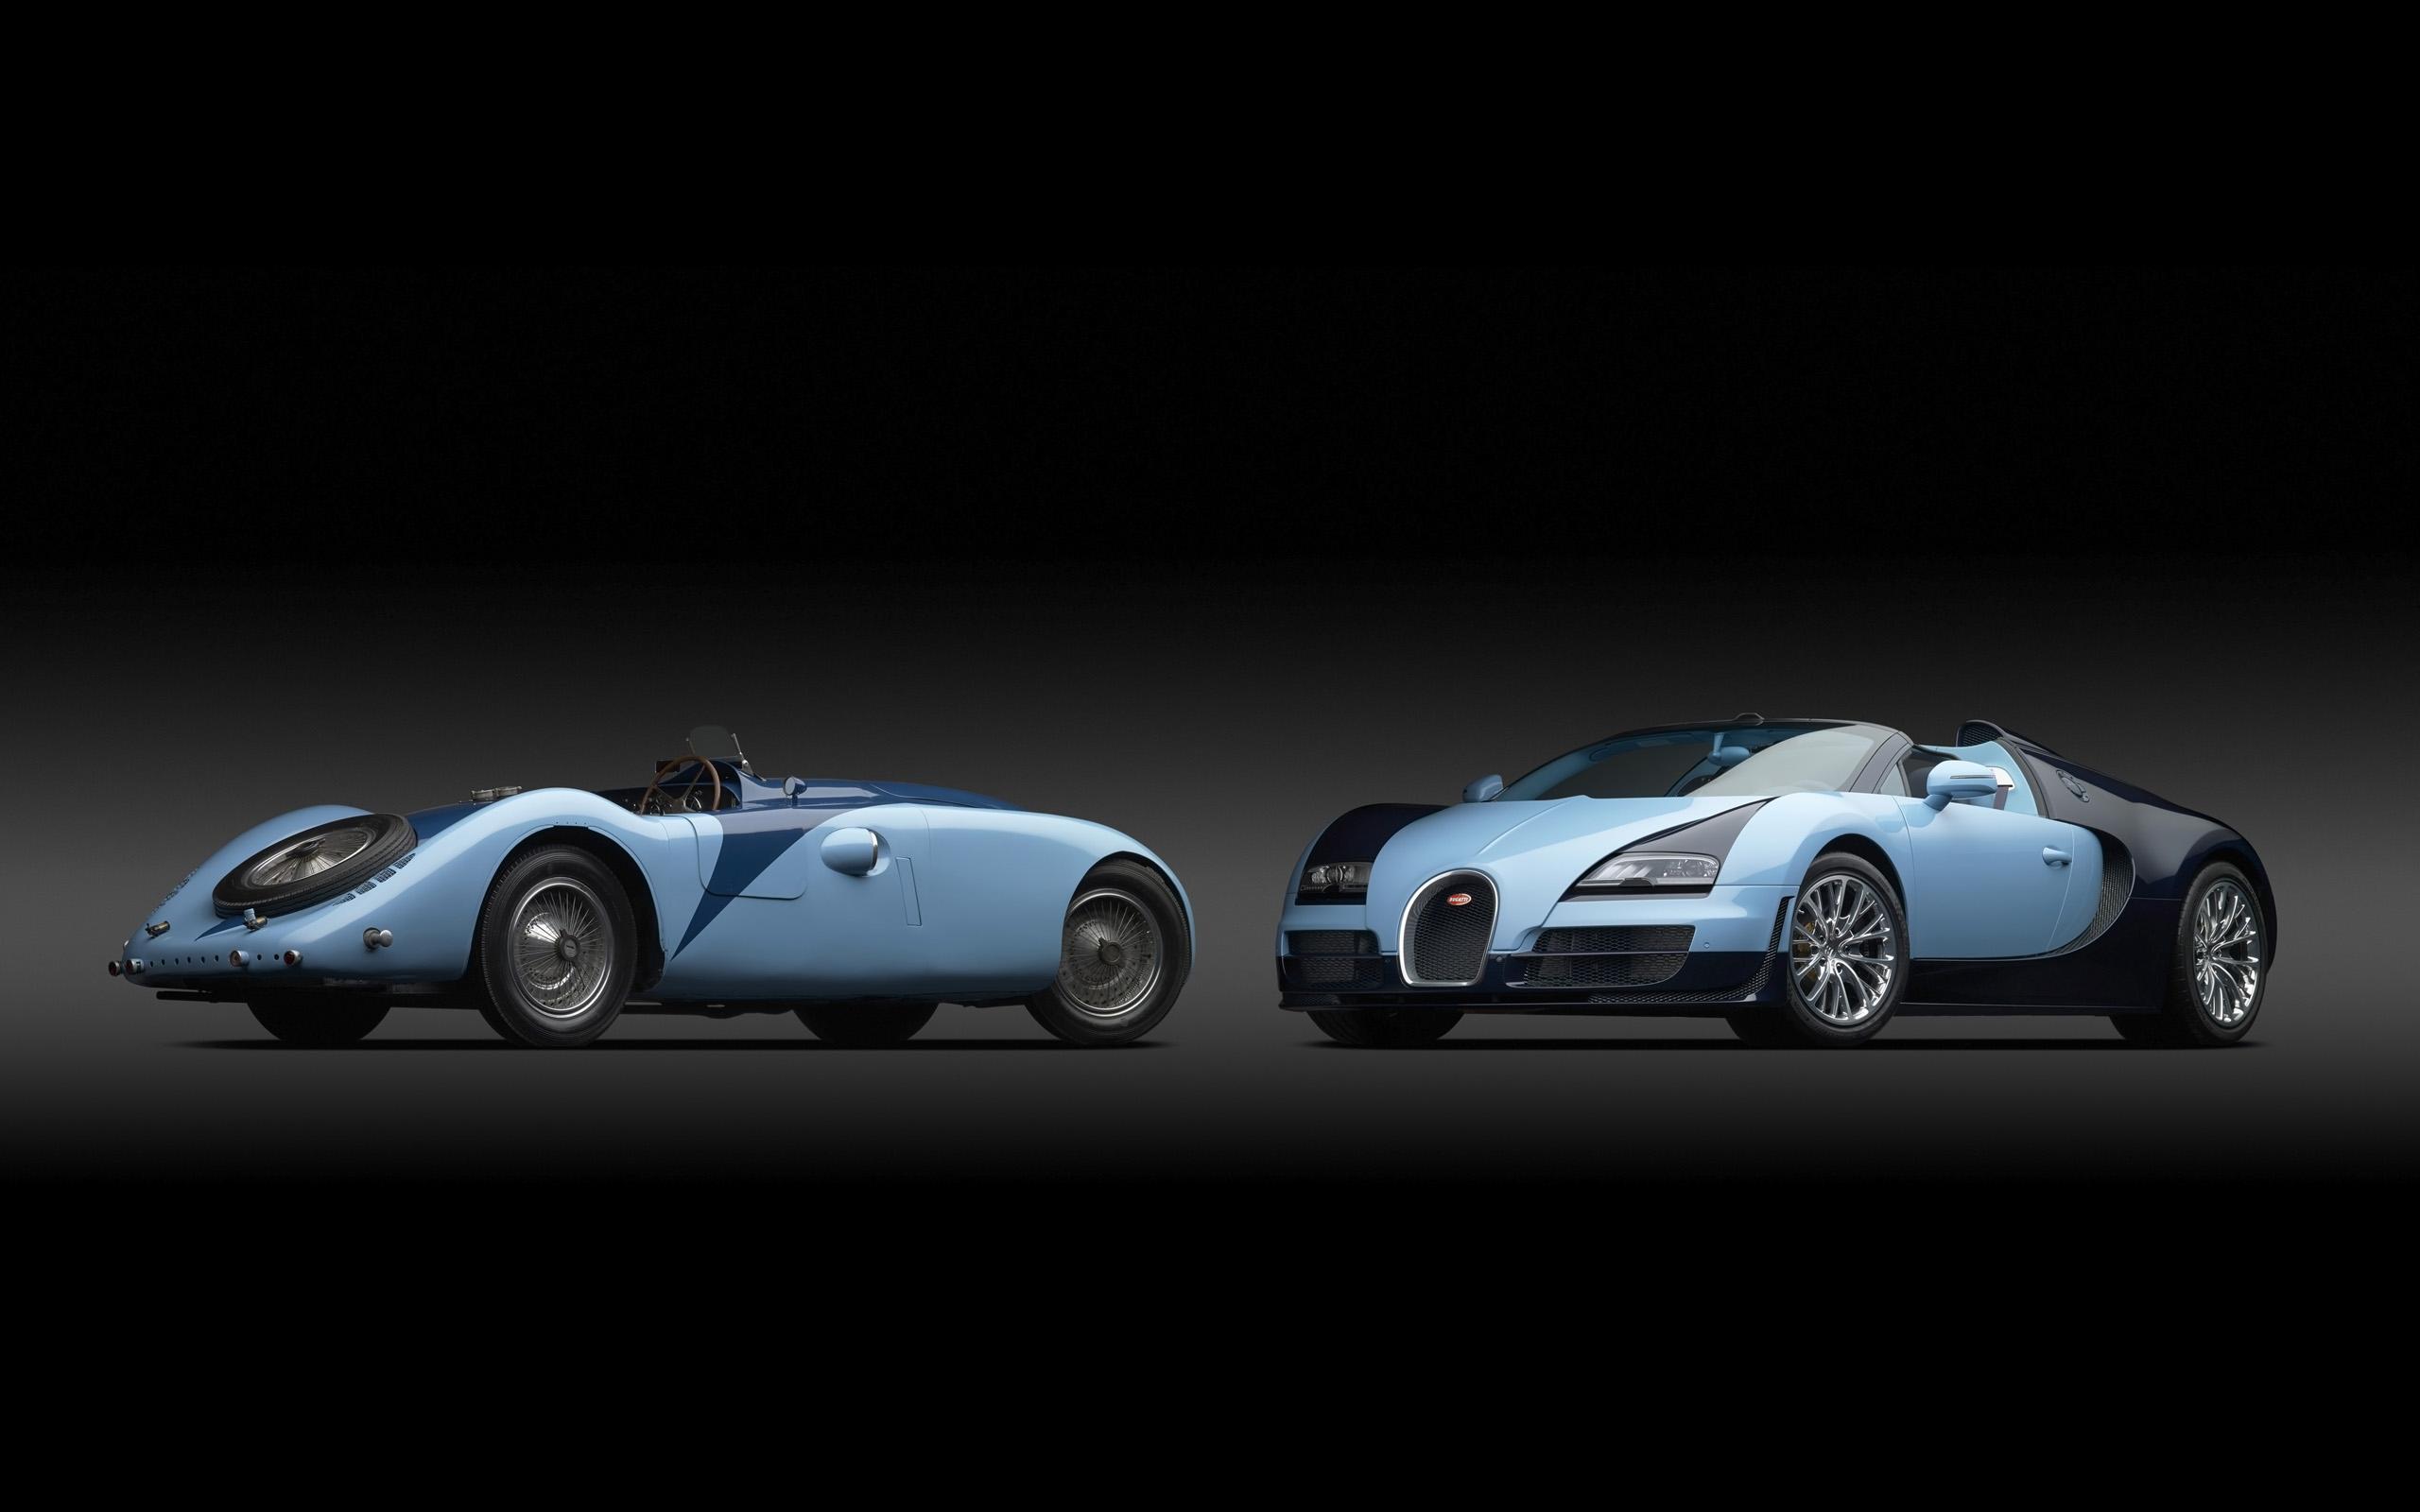 2013 bugatti veyron grand sport vitesse supercar retro g wallpaper 2560x160. Black Bedroom Furniture Sets. Home Design Ideas